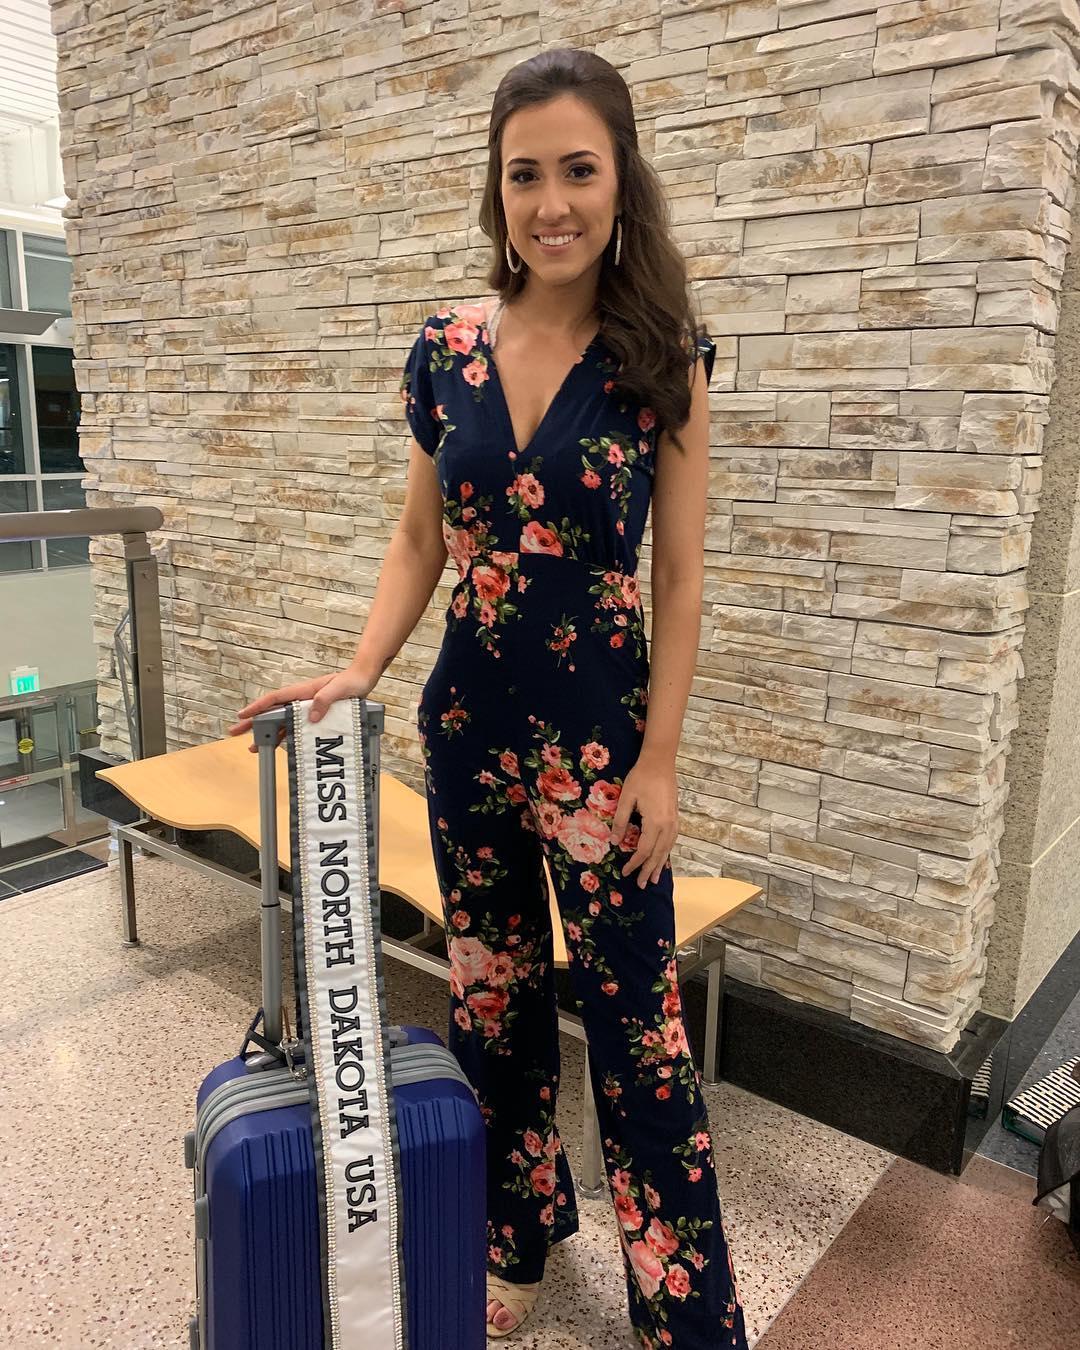 candidatas a miss usa 2019. final: 2 may. - Página 17 Wdt286qk